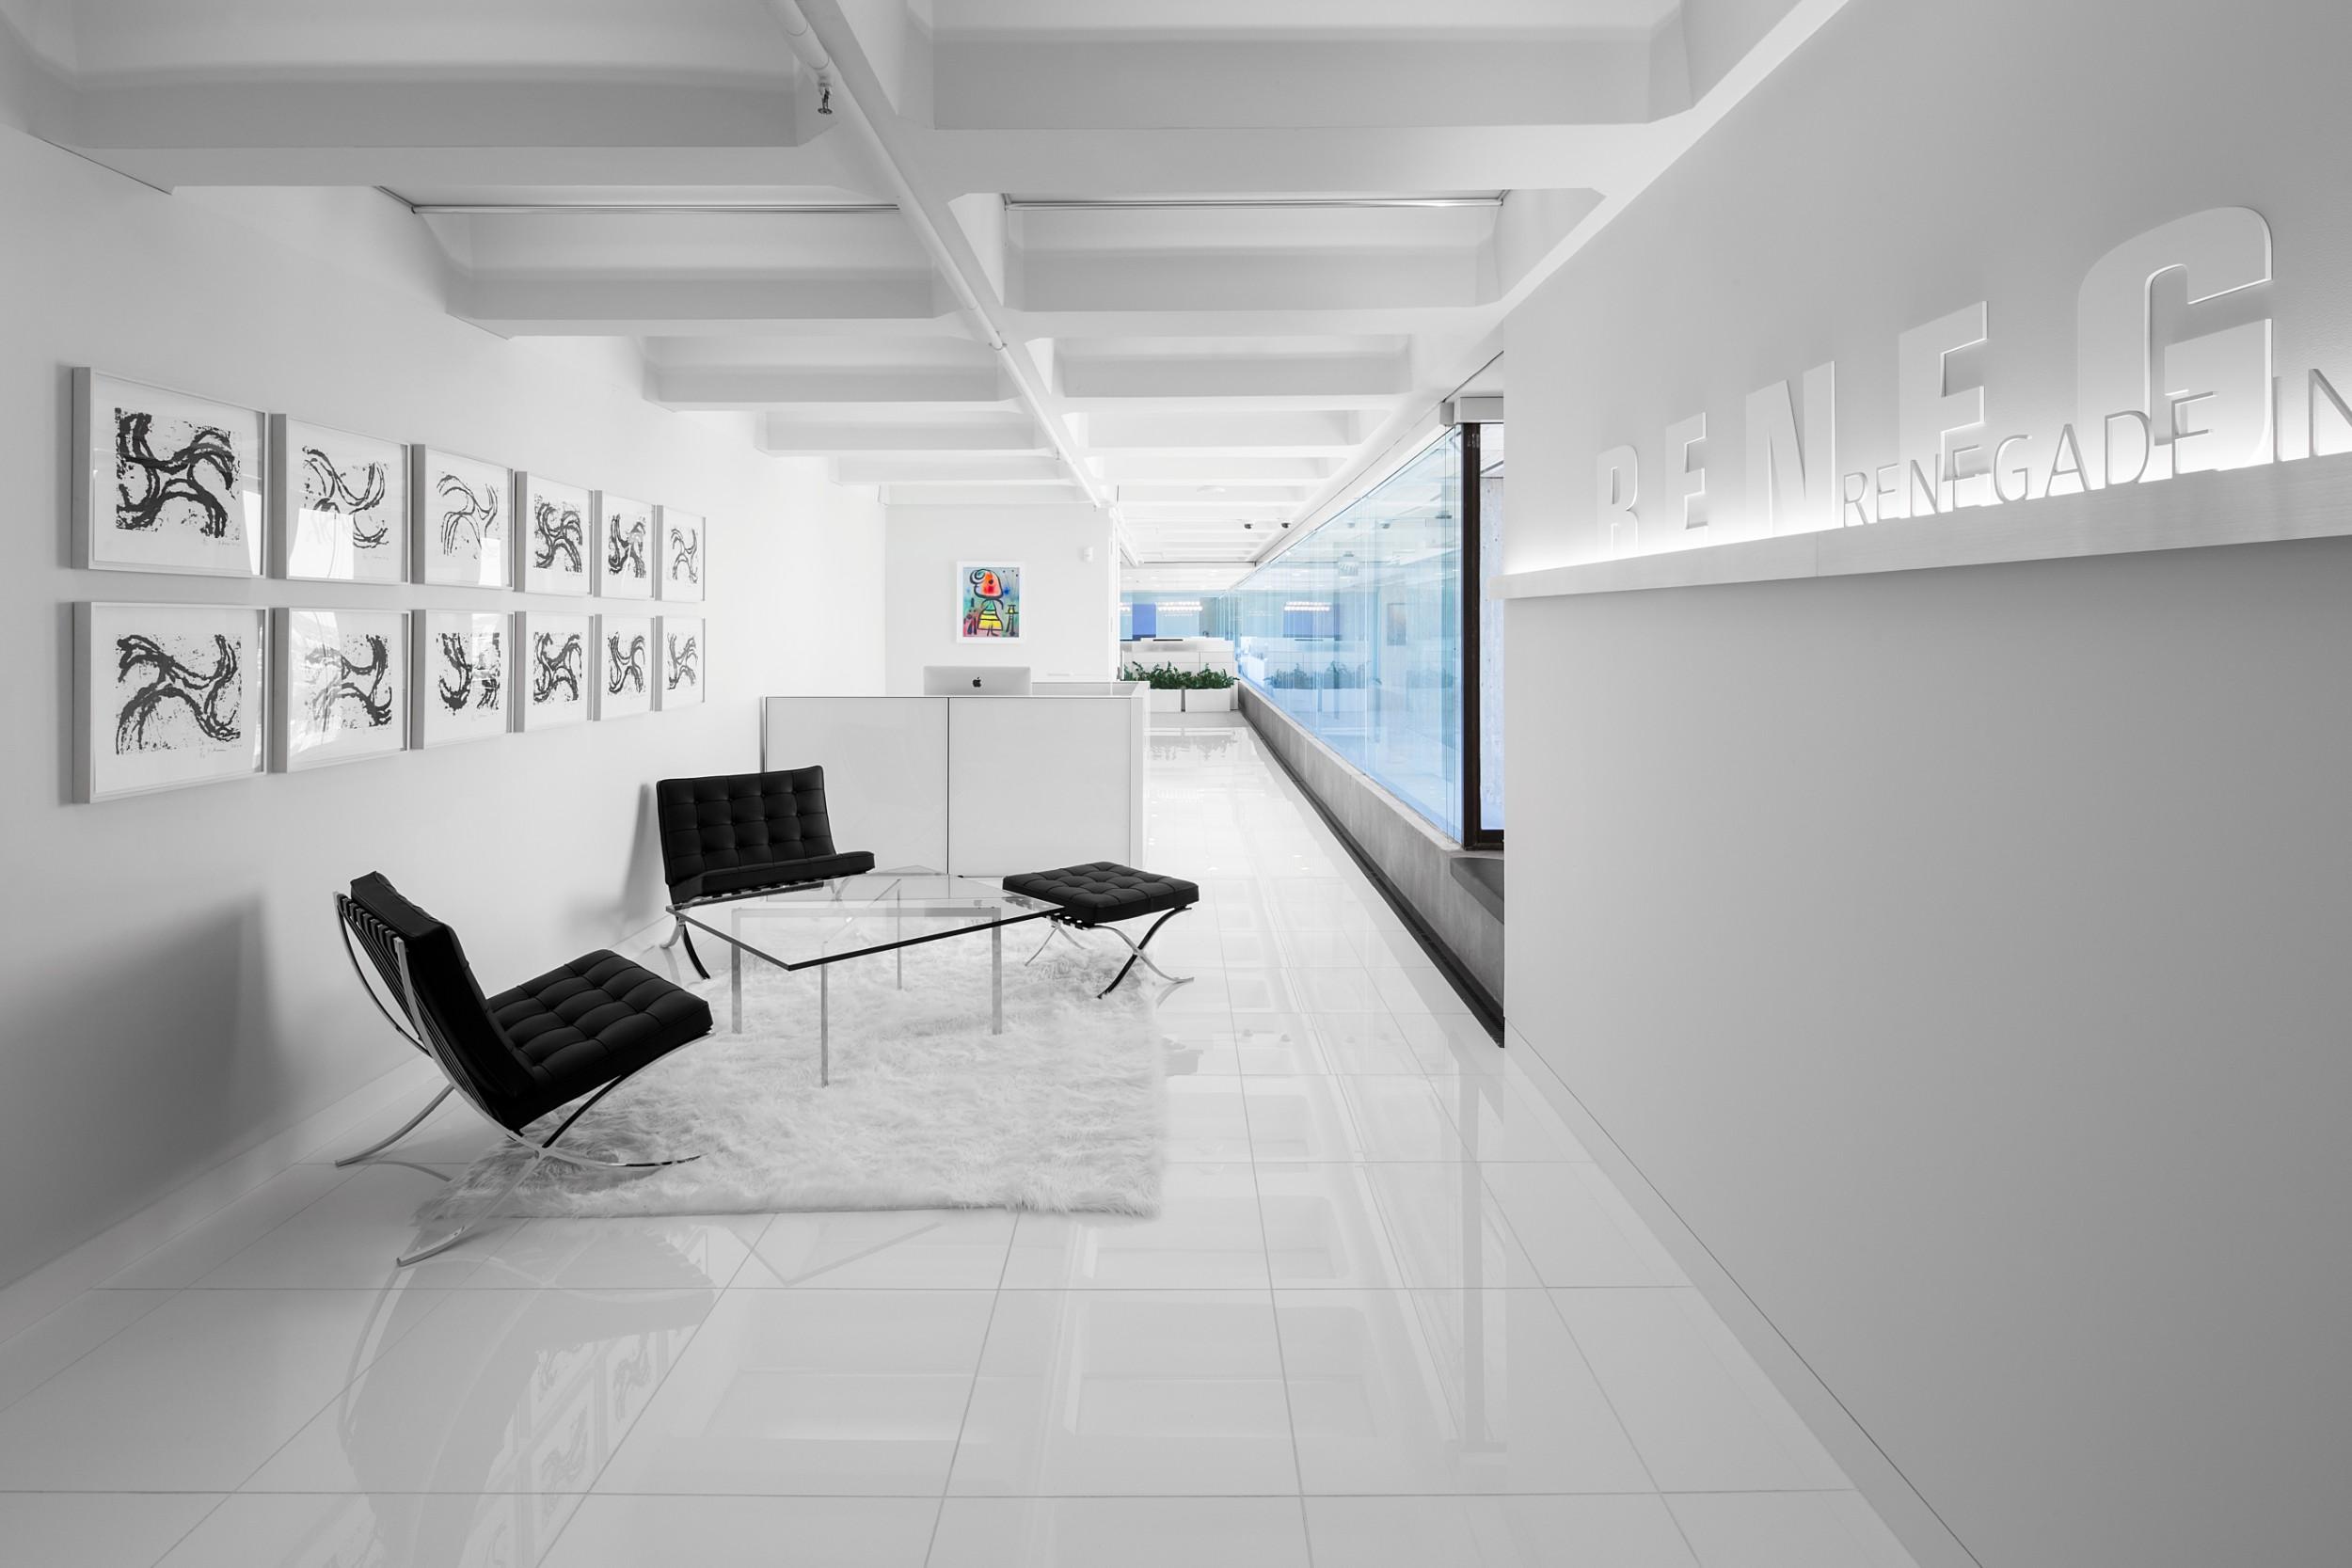 Renegade_Investments_Corderman_Construction_Boston_Reception.jpg